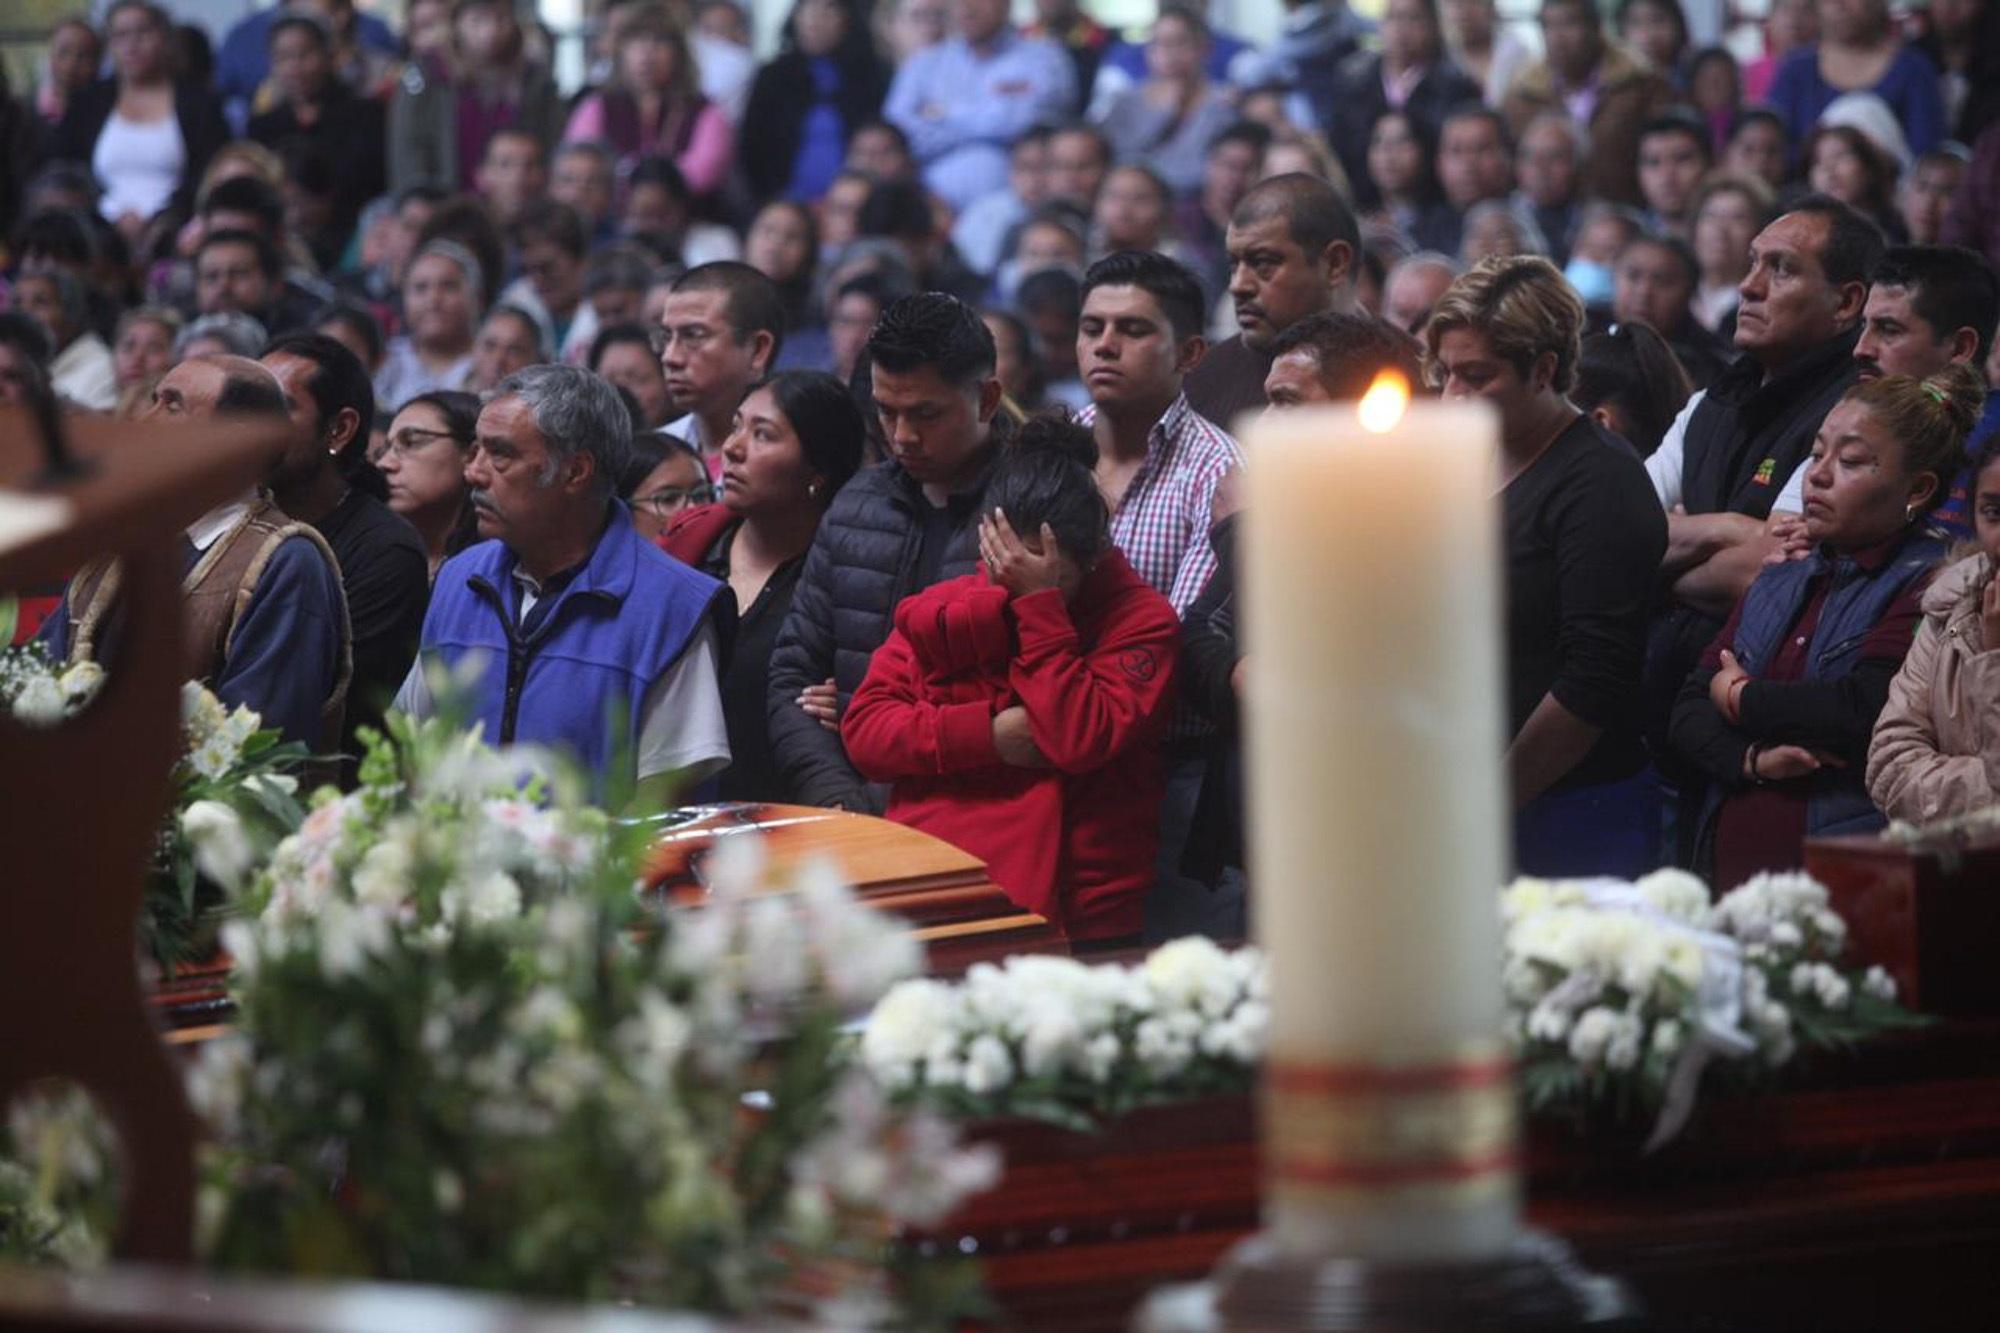 Insuficiente panteón de Tlahuelilpan para enterrar a los muertos por explosión